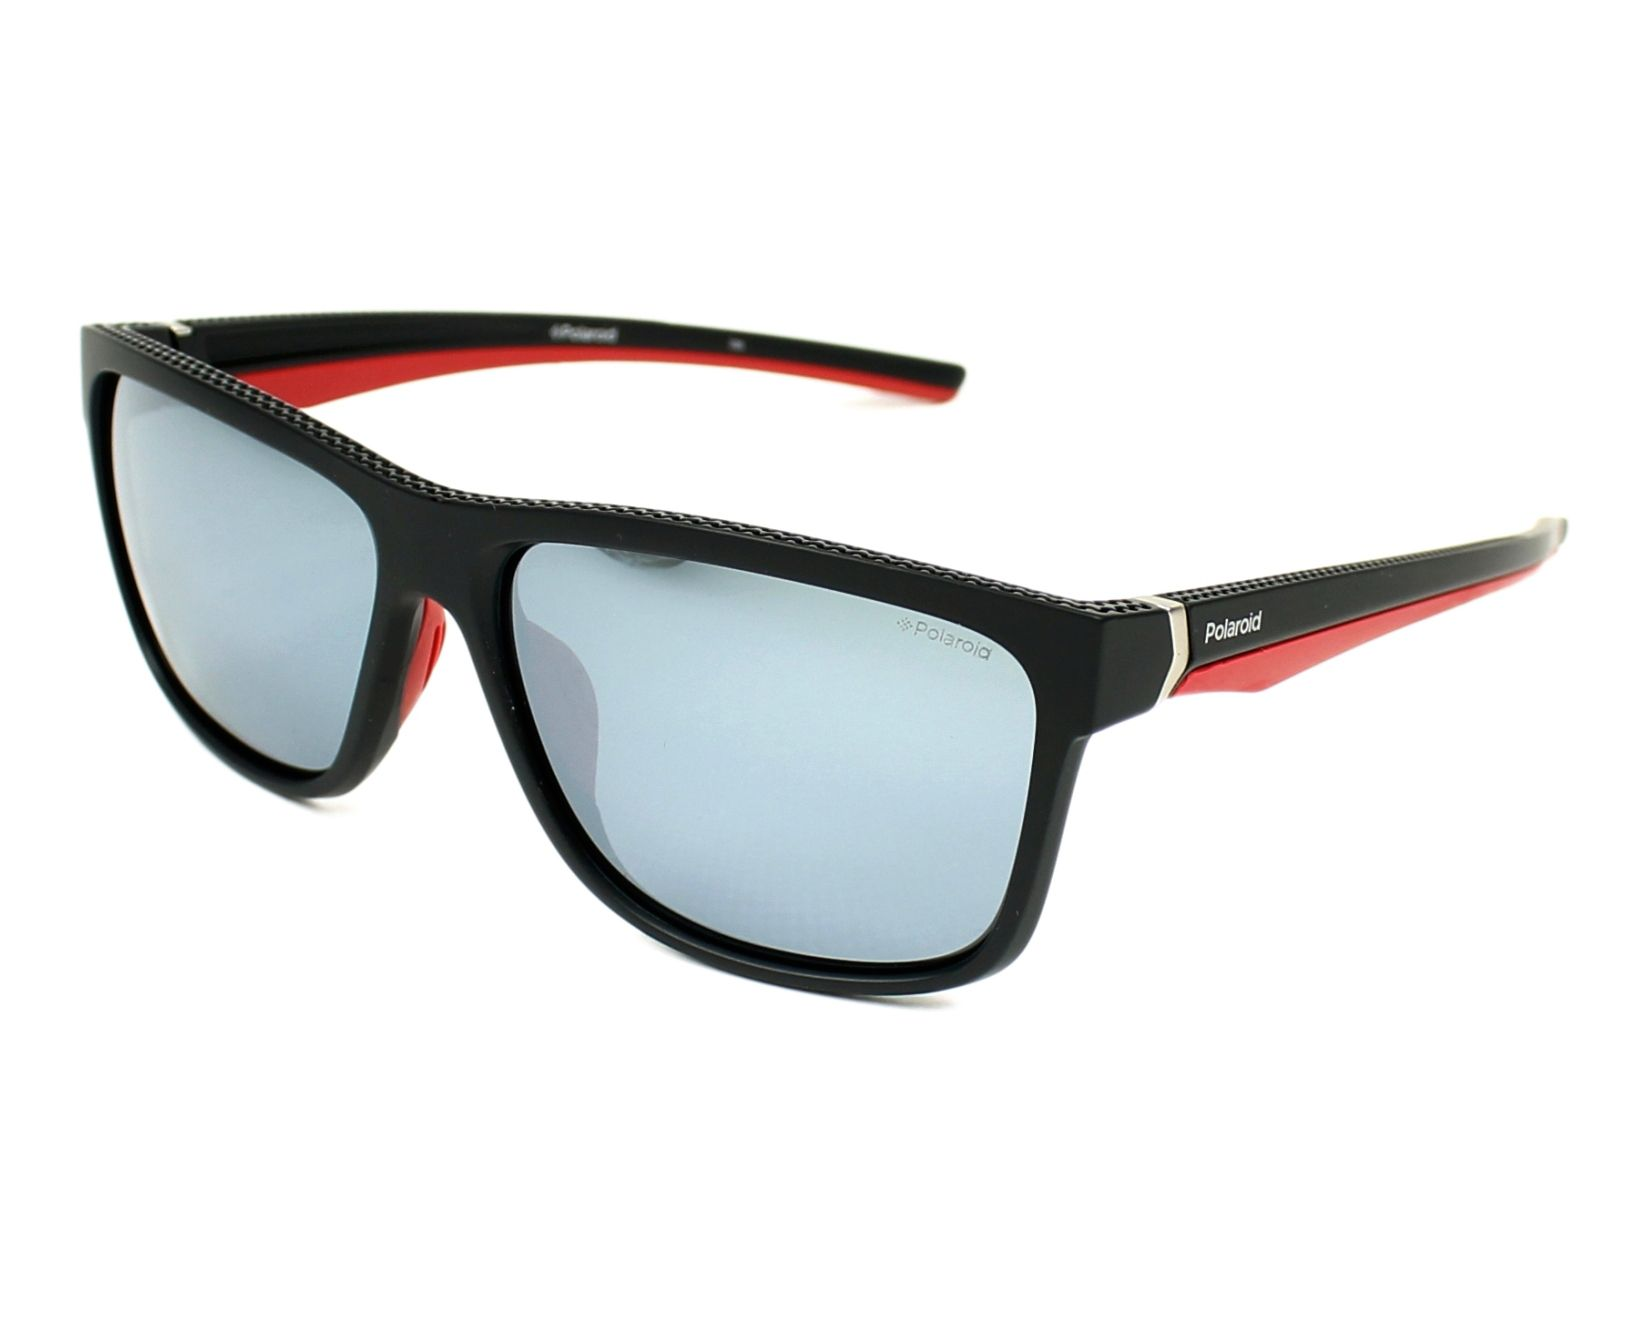 Sonnenbrille Polaroid 7014 ZyCwSFfJk